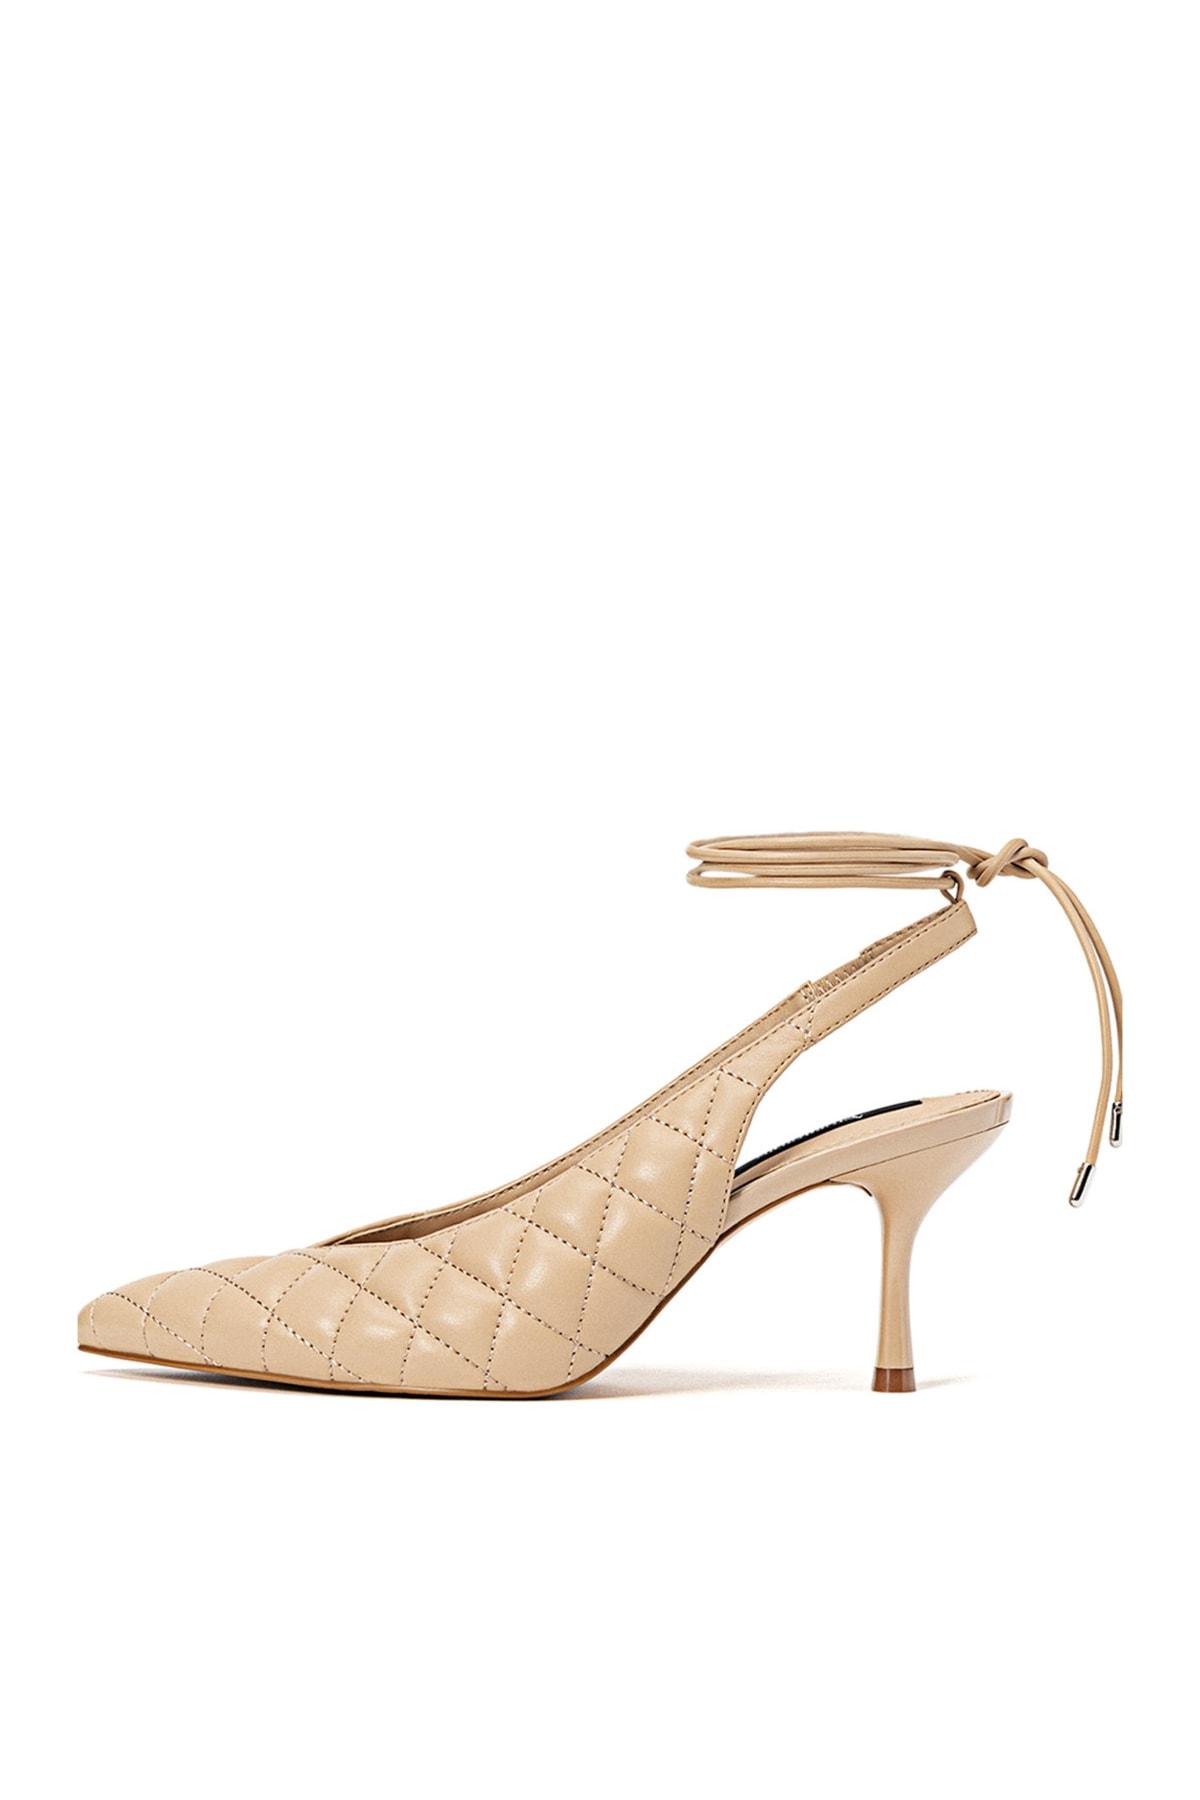 Stradivarius Kadın Bej Yüksek Topuklu Kapitone Ayakkabı 19653670 1